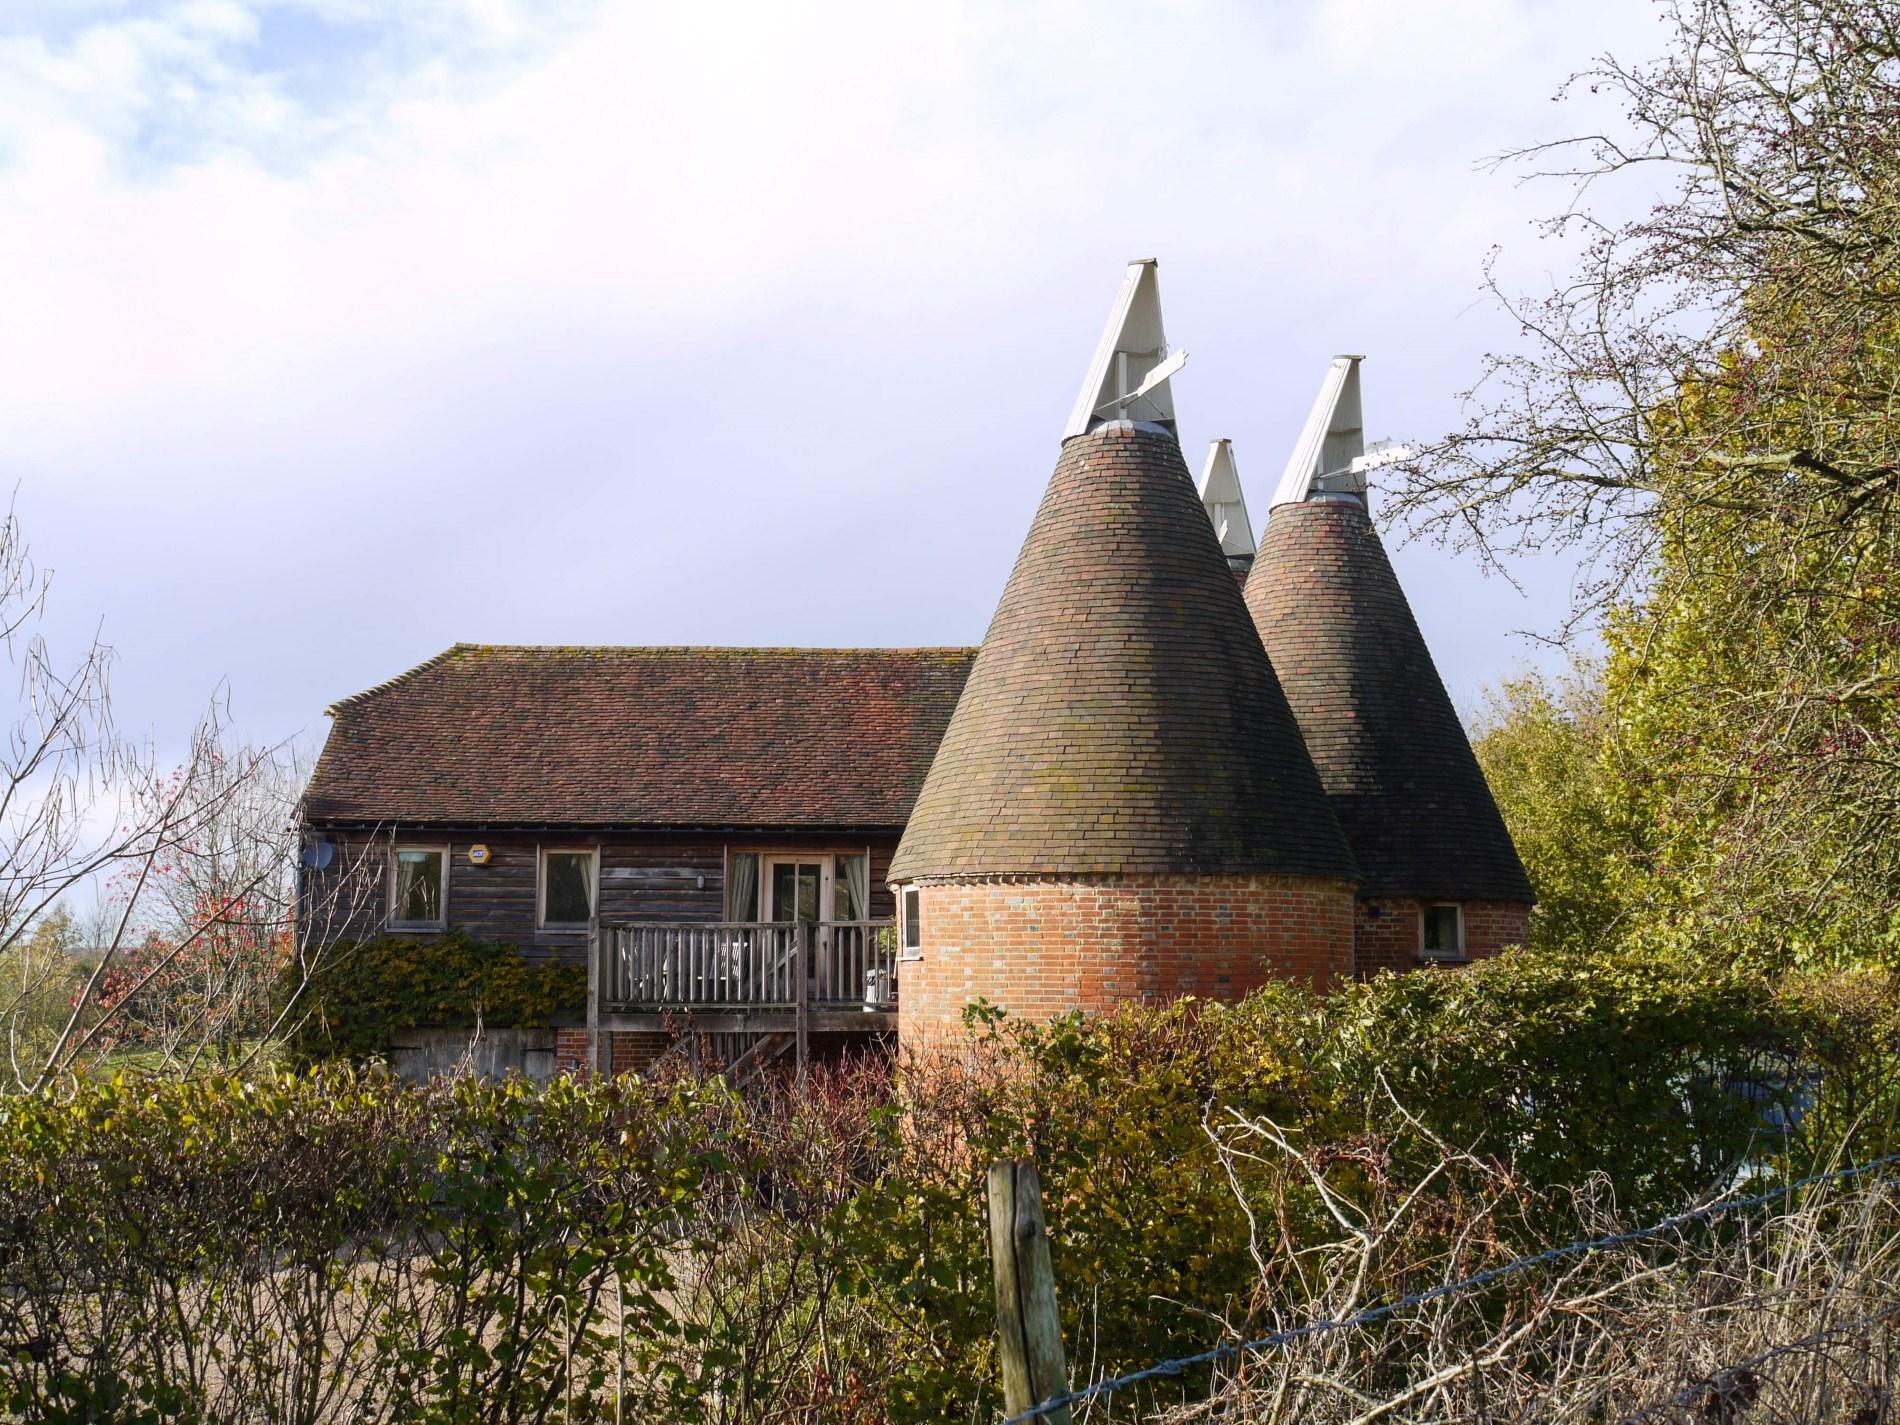 Part of 16th century Oast House